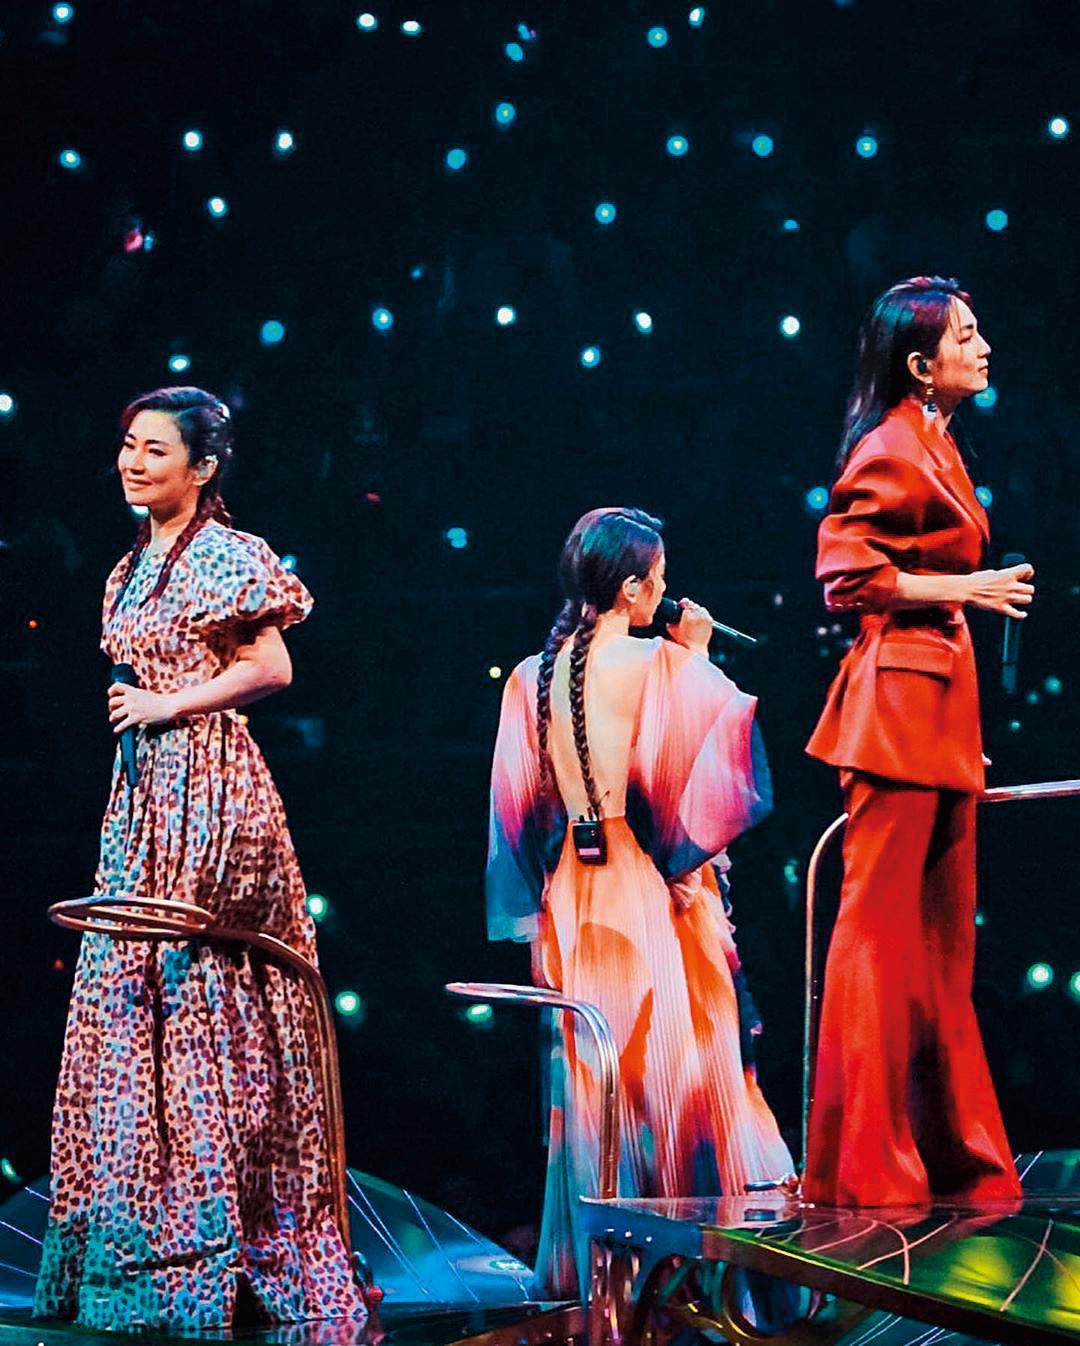 S.H.E在金曲30合體演出,Selina(左)獨唱〈十七〉第一句就走音,Hebe田馥甄(中)和Ella陳嘉樺(右)立刻神救援接唱,3人默契絕佳。(翻攝自Selina IG)